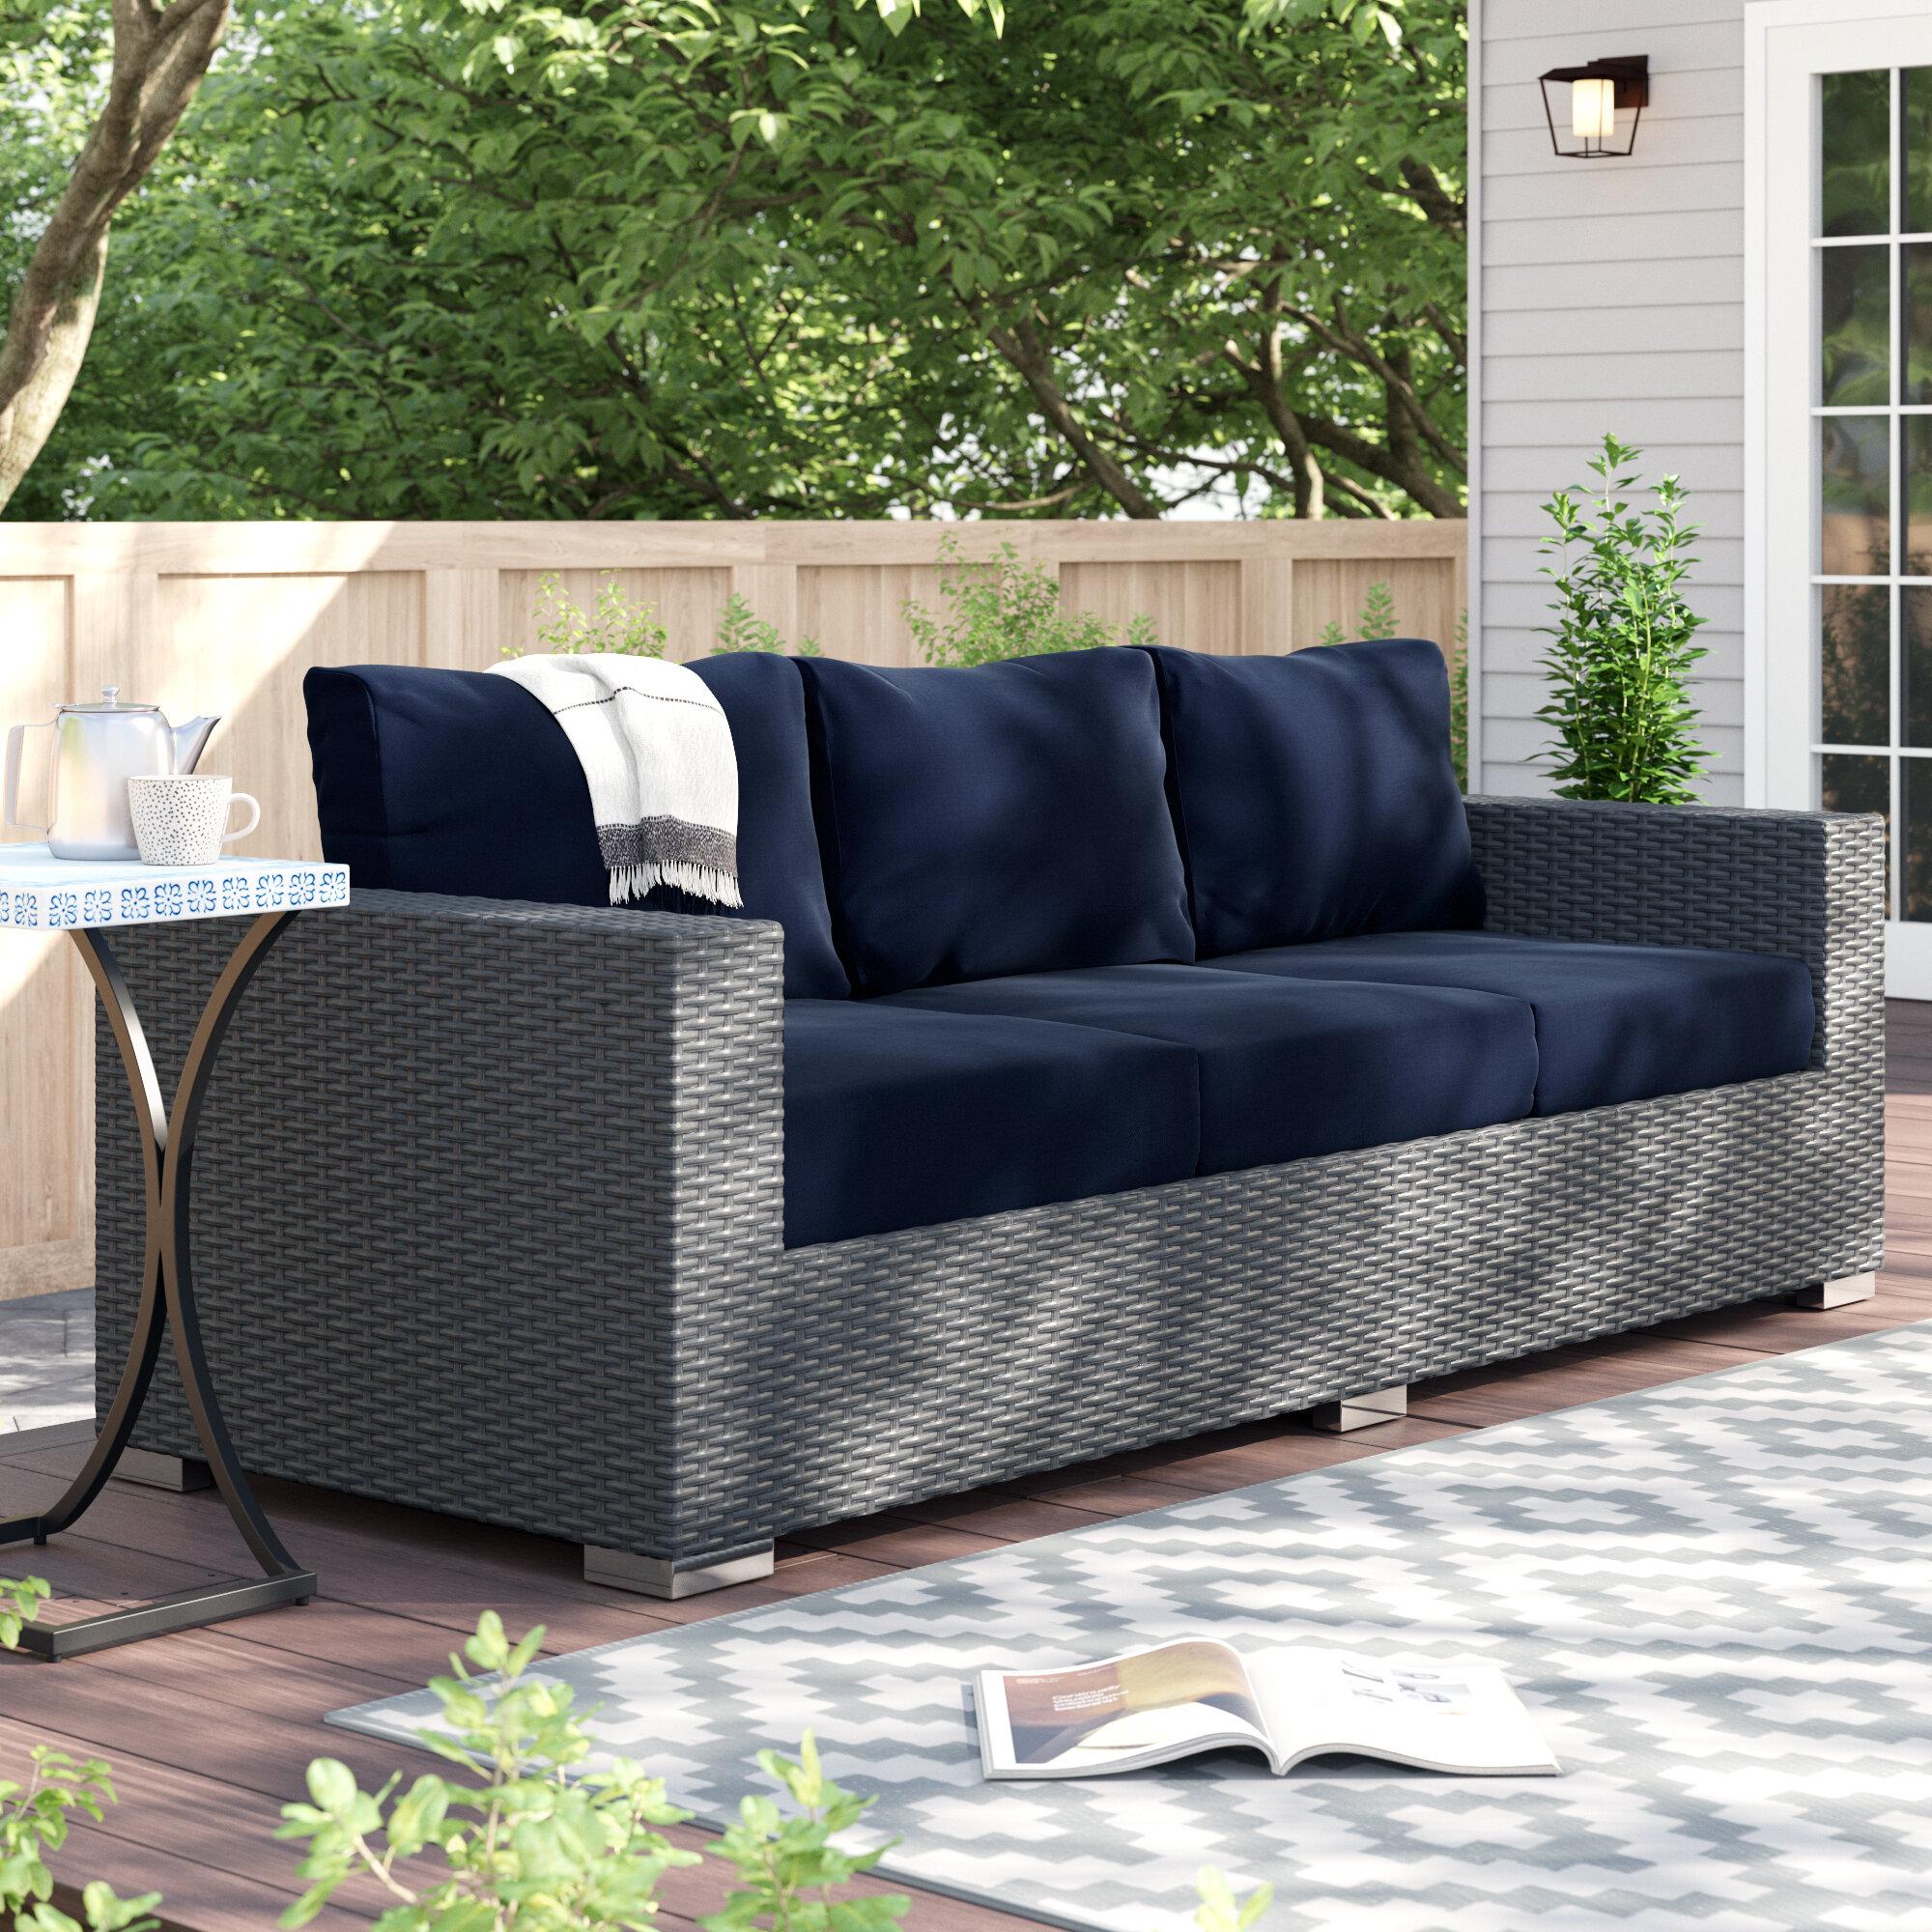 Brayden Studio Tripp Patio Sofa With Sunbrella Cushions Reviews Wayfair